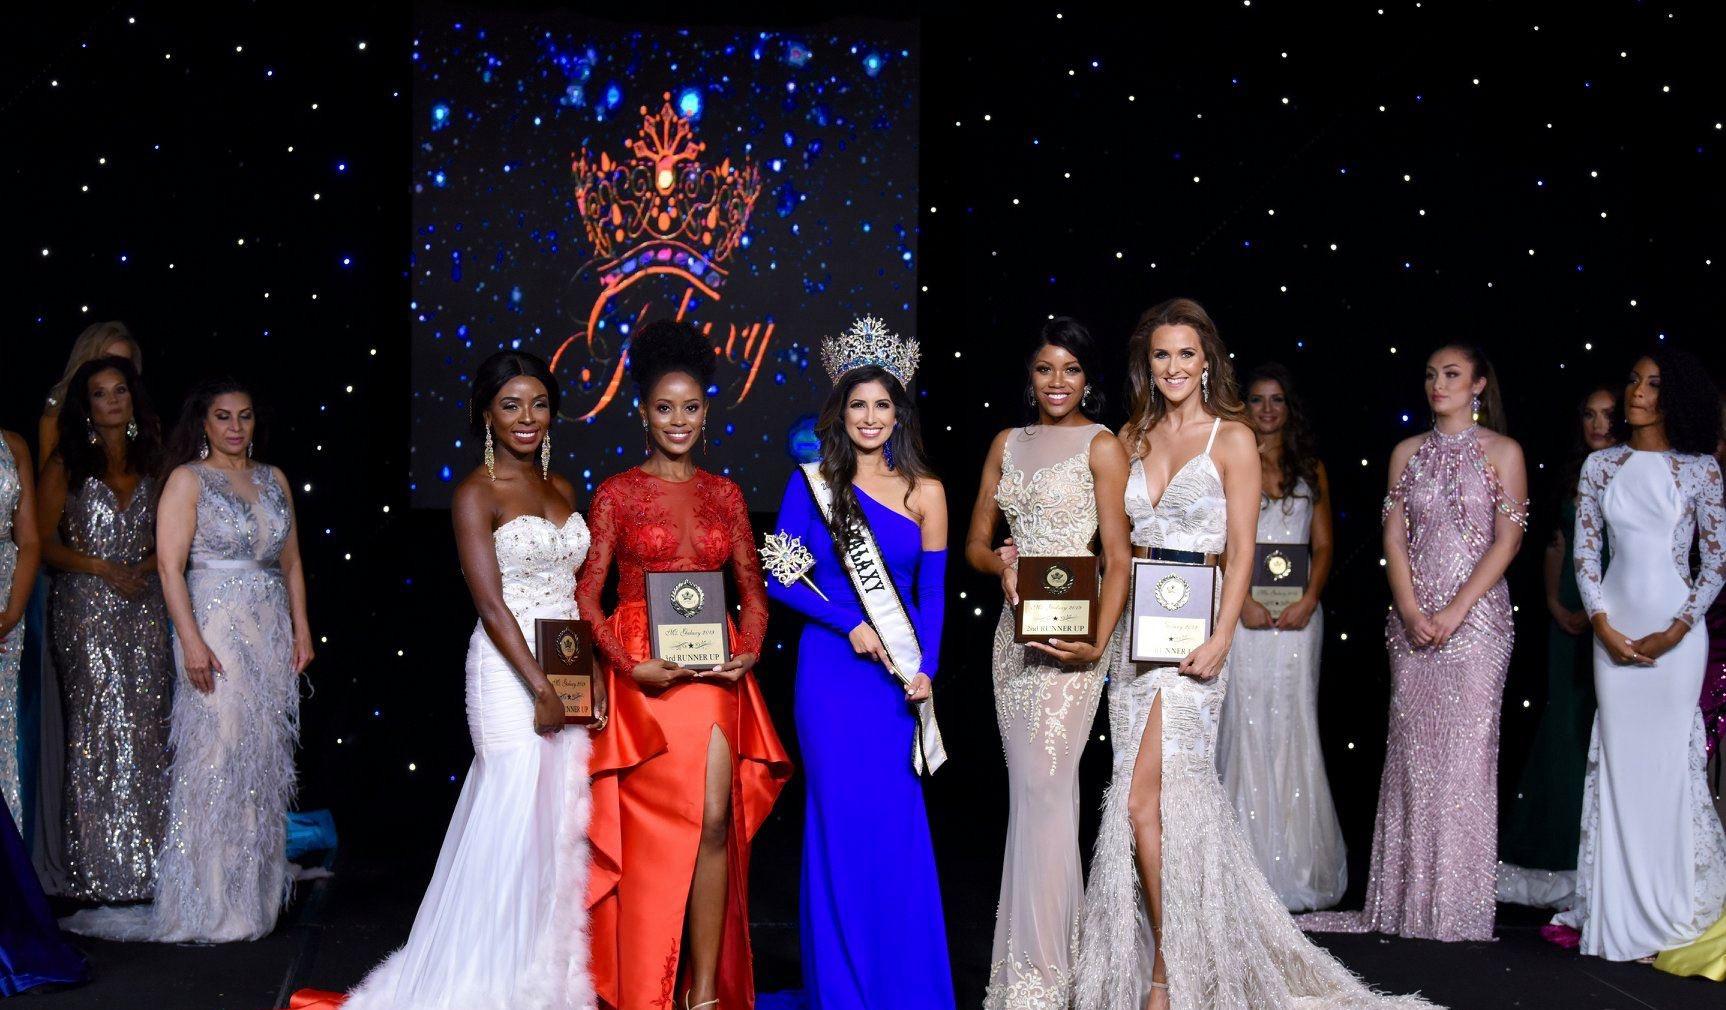 Congratulations Shiko, Ms Galaxy® 2020 3rd Runner Up